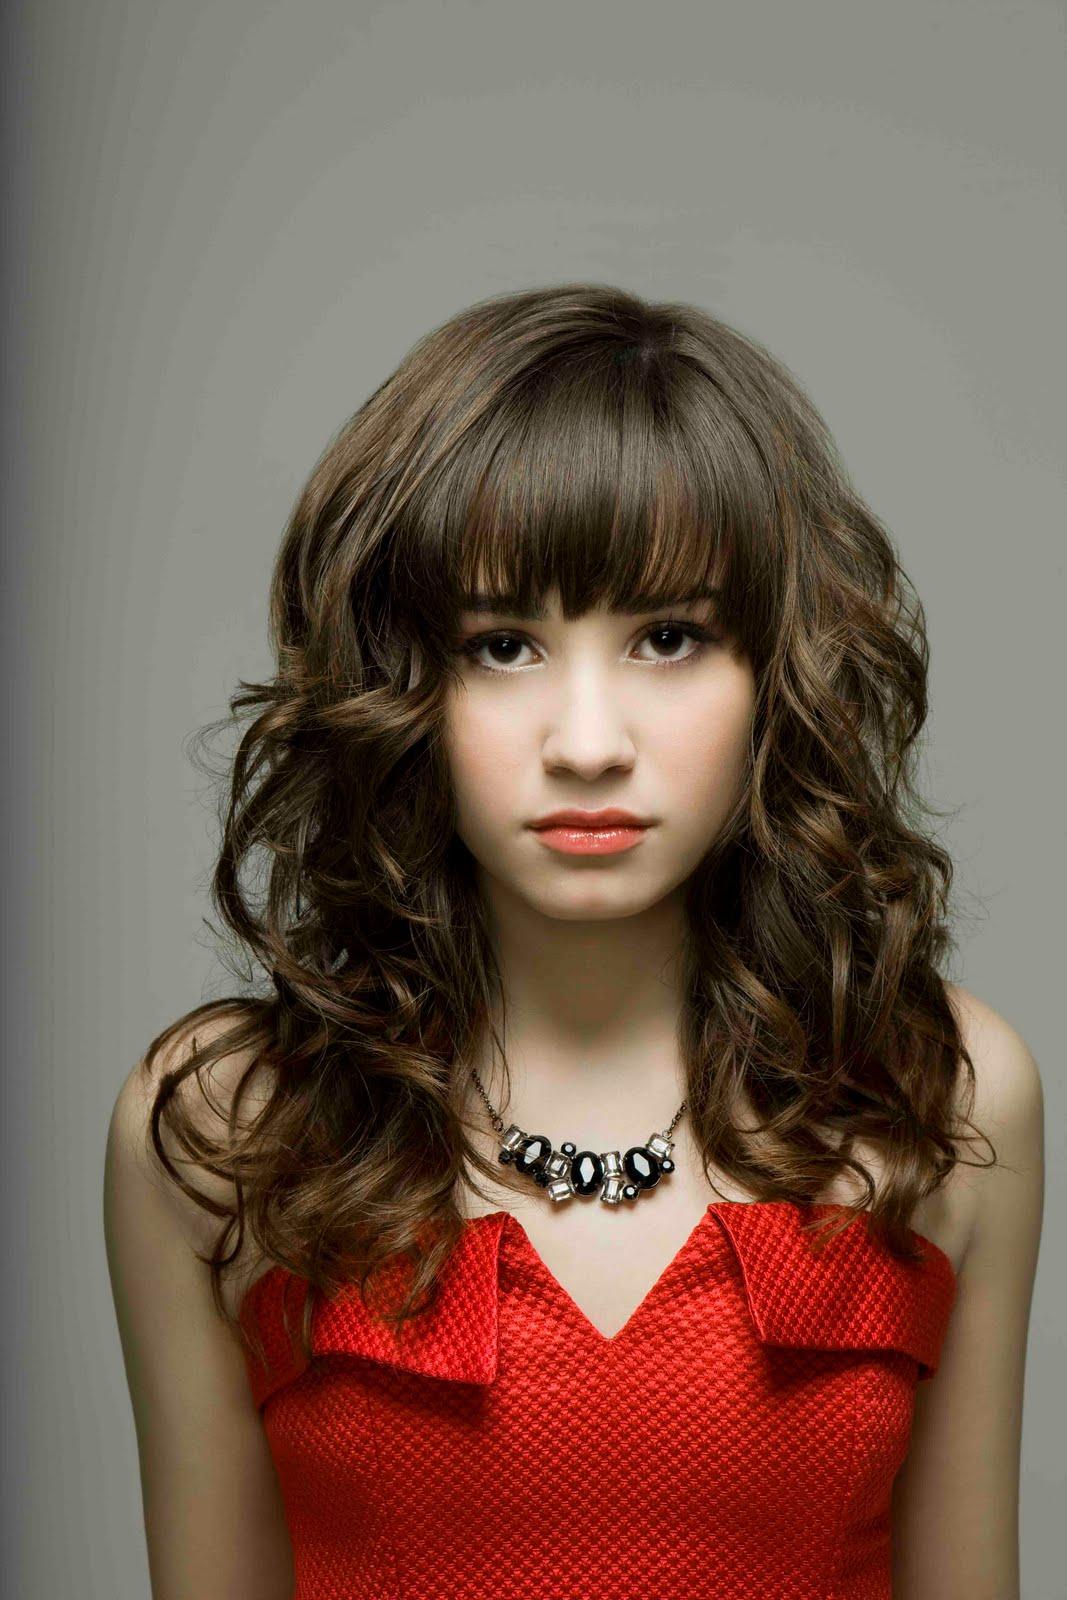 http://3.bp.blogspot.com/_YsfyOaOrlv4/SwUex5_oOCI/AAAAAAAACXU/57kF-0jiS4o/s1600/Demi+Lovato+-+Don%27t+Forget.jpg